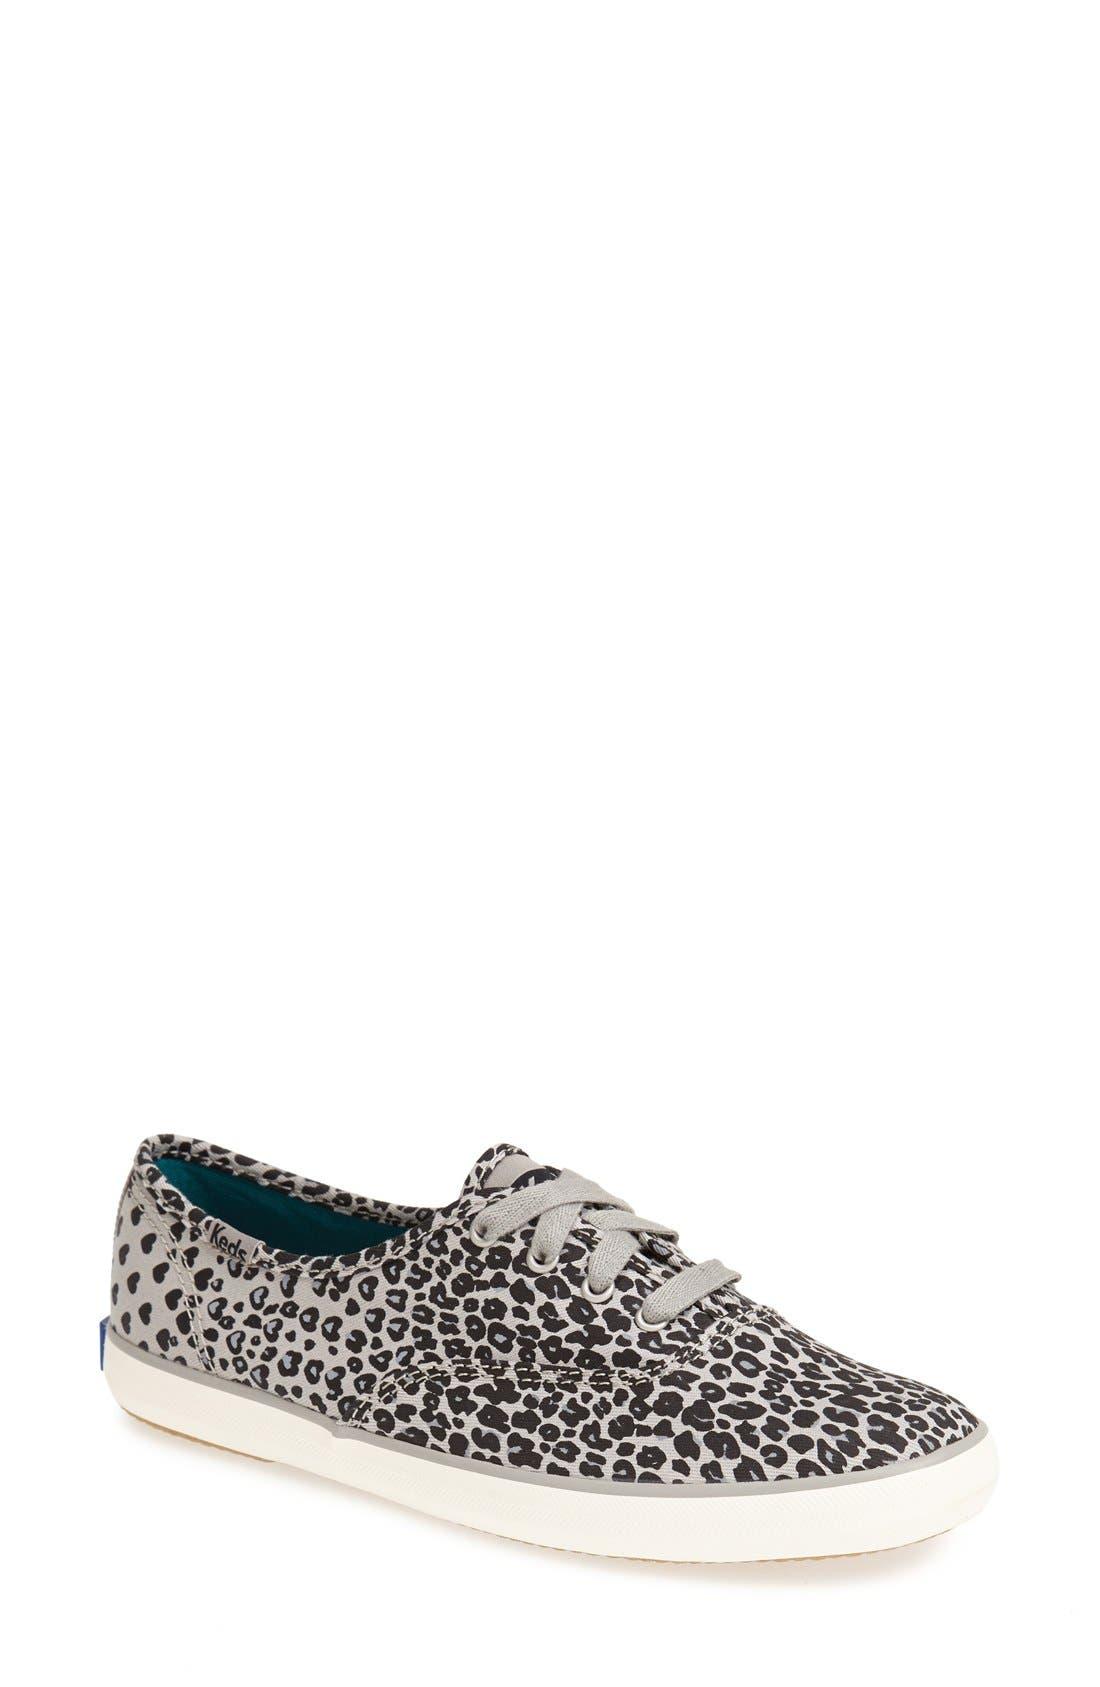 KEDS<SUP>®</SUP> 'Champion - Leopard' Sneaker, Main, color, 001